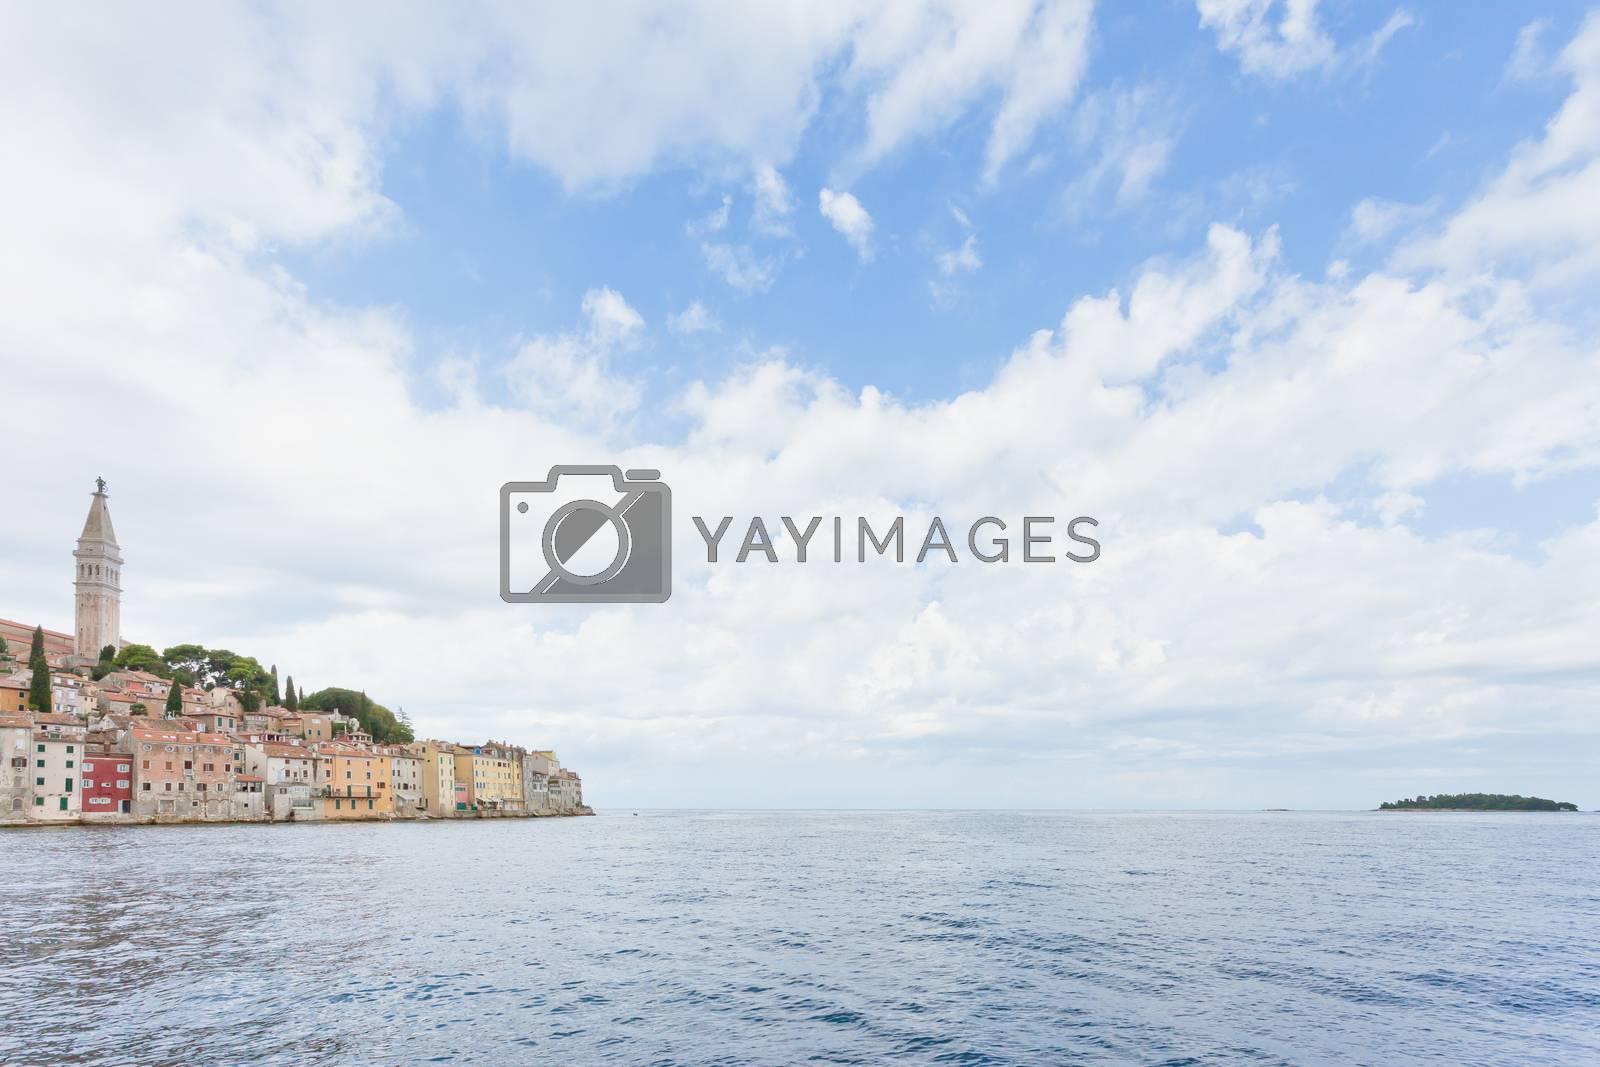 Rovinj, Istria, Croatia, Europe - Arriving in Rovinj across the Mediterranean Sea